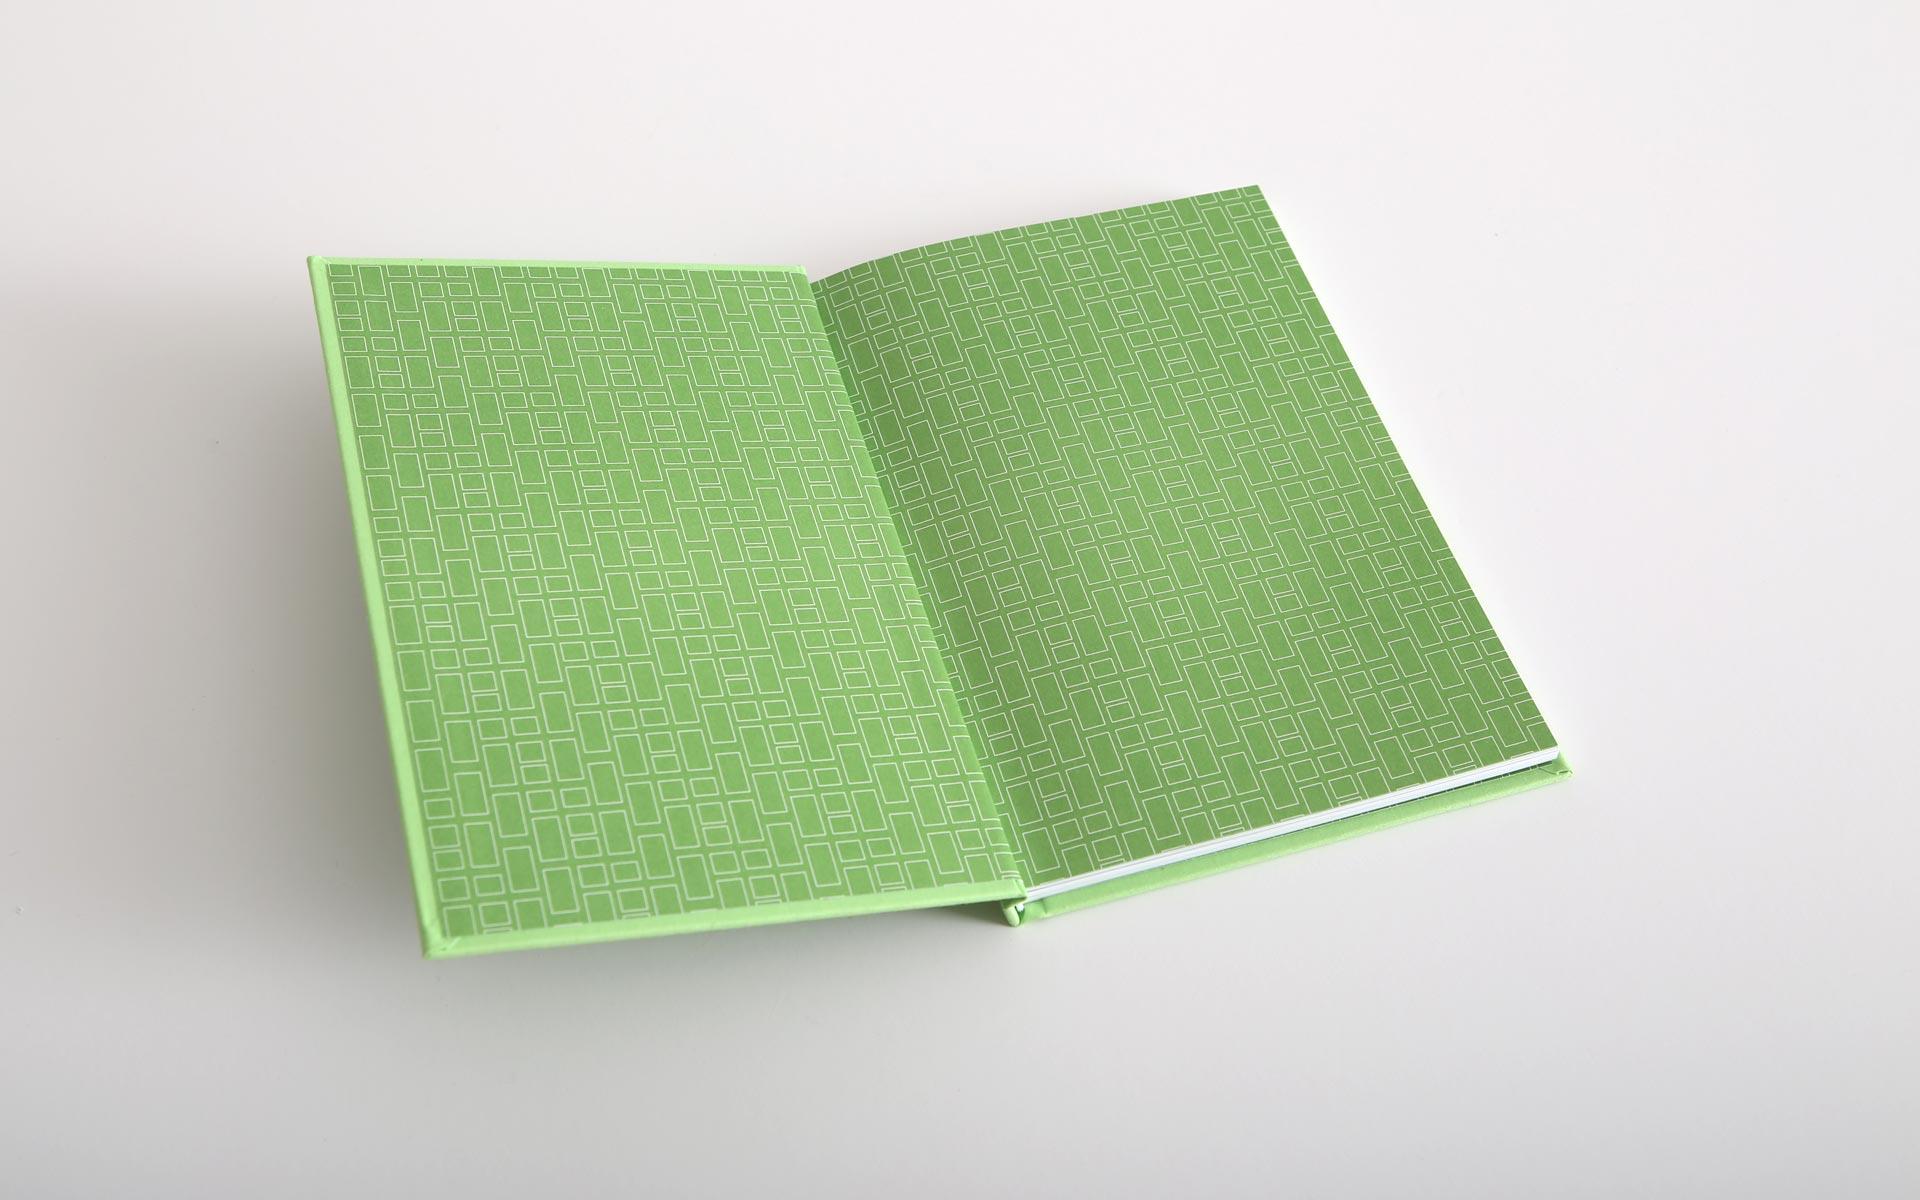 ubc-sala-book-design-2